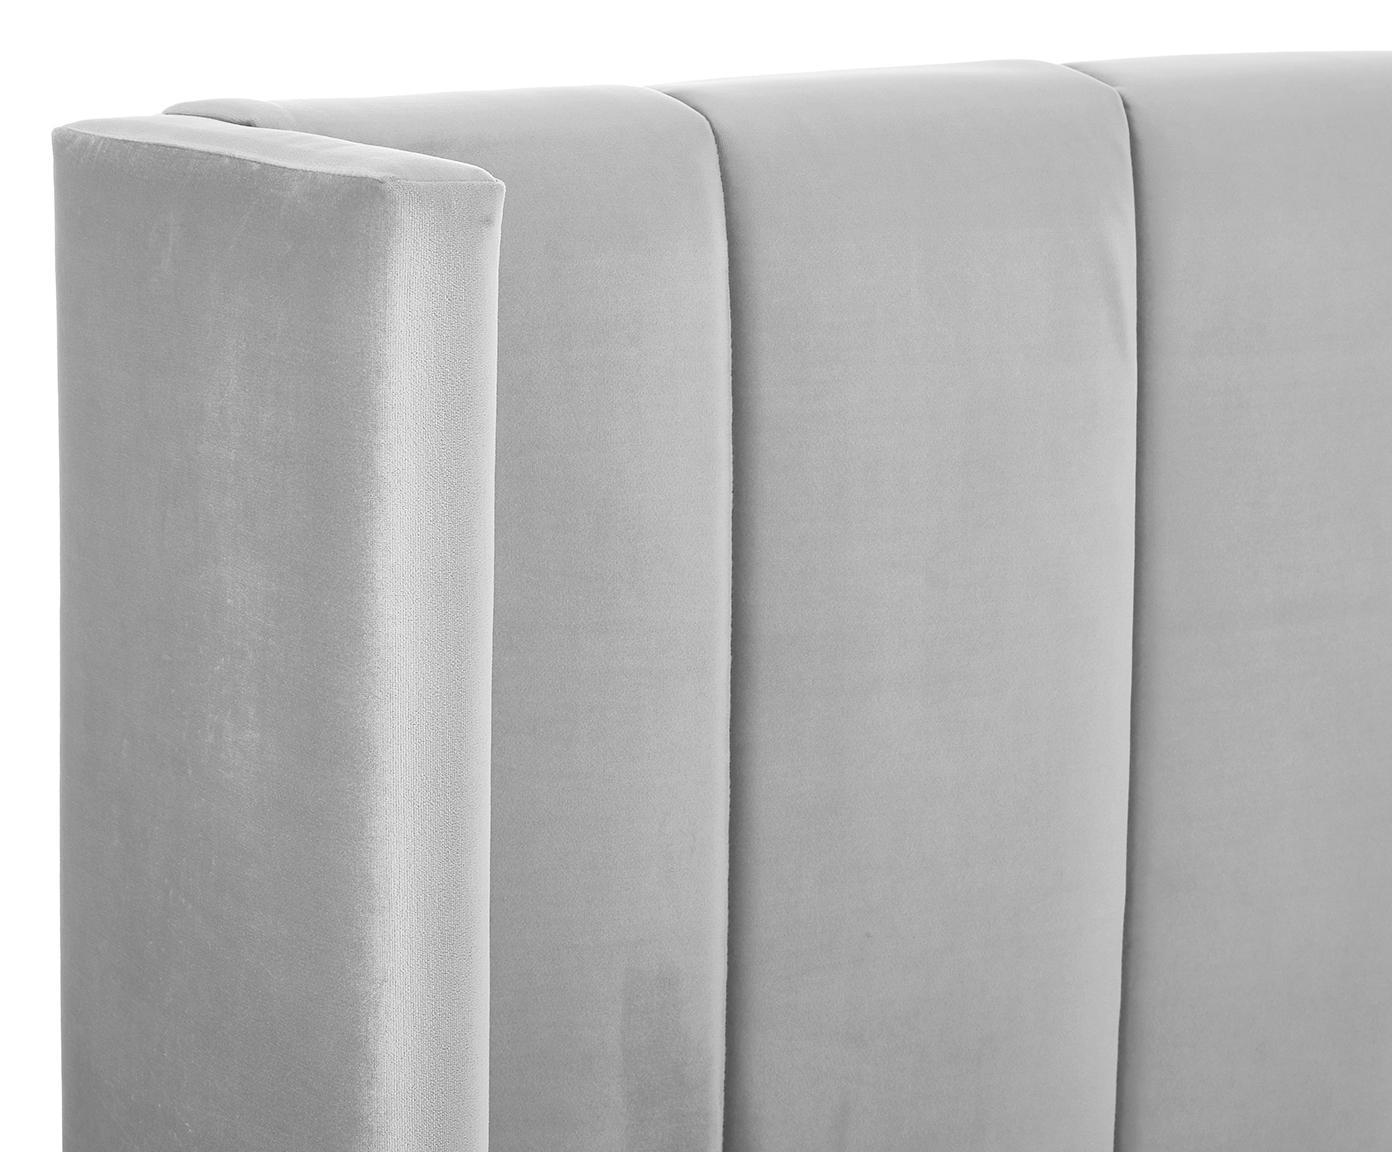 Samt-Polsterbett Dusk, Korpus: Massives Kiefernholz, Bezug: Polyestersamt 30.000 Sche, Hellgrau, 160 x 200 cm